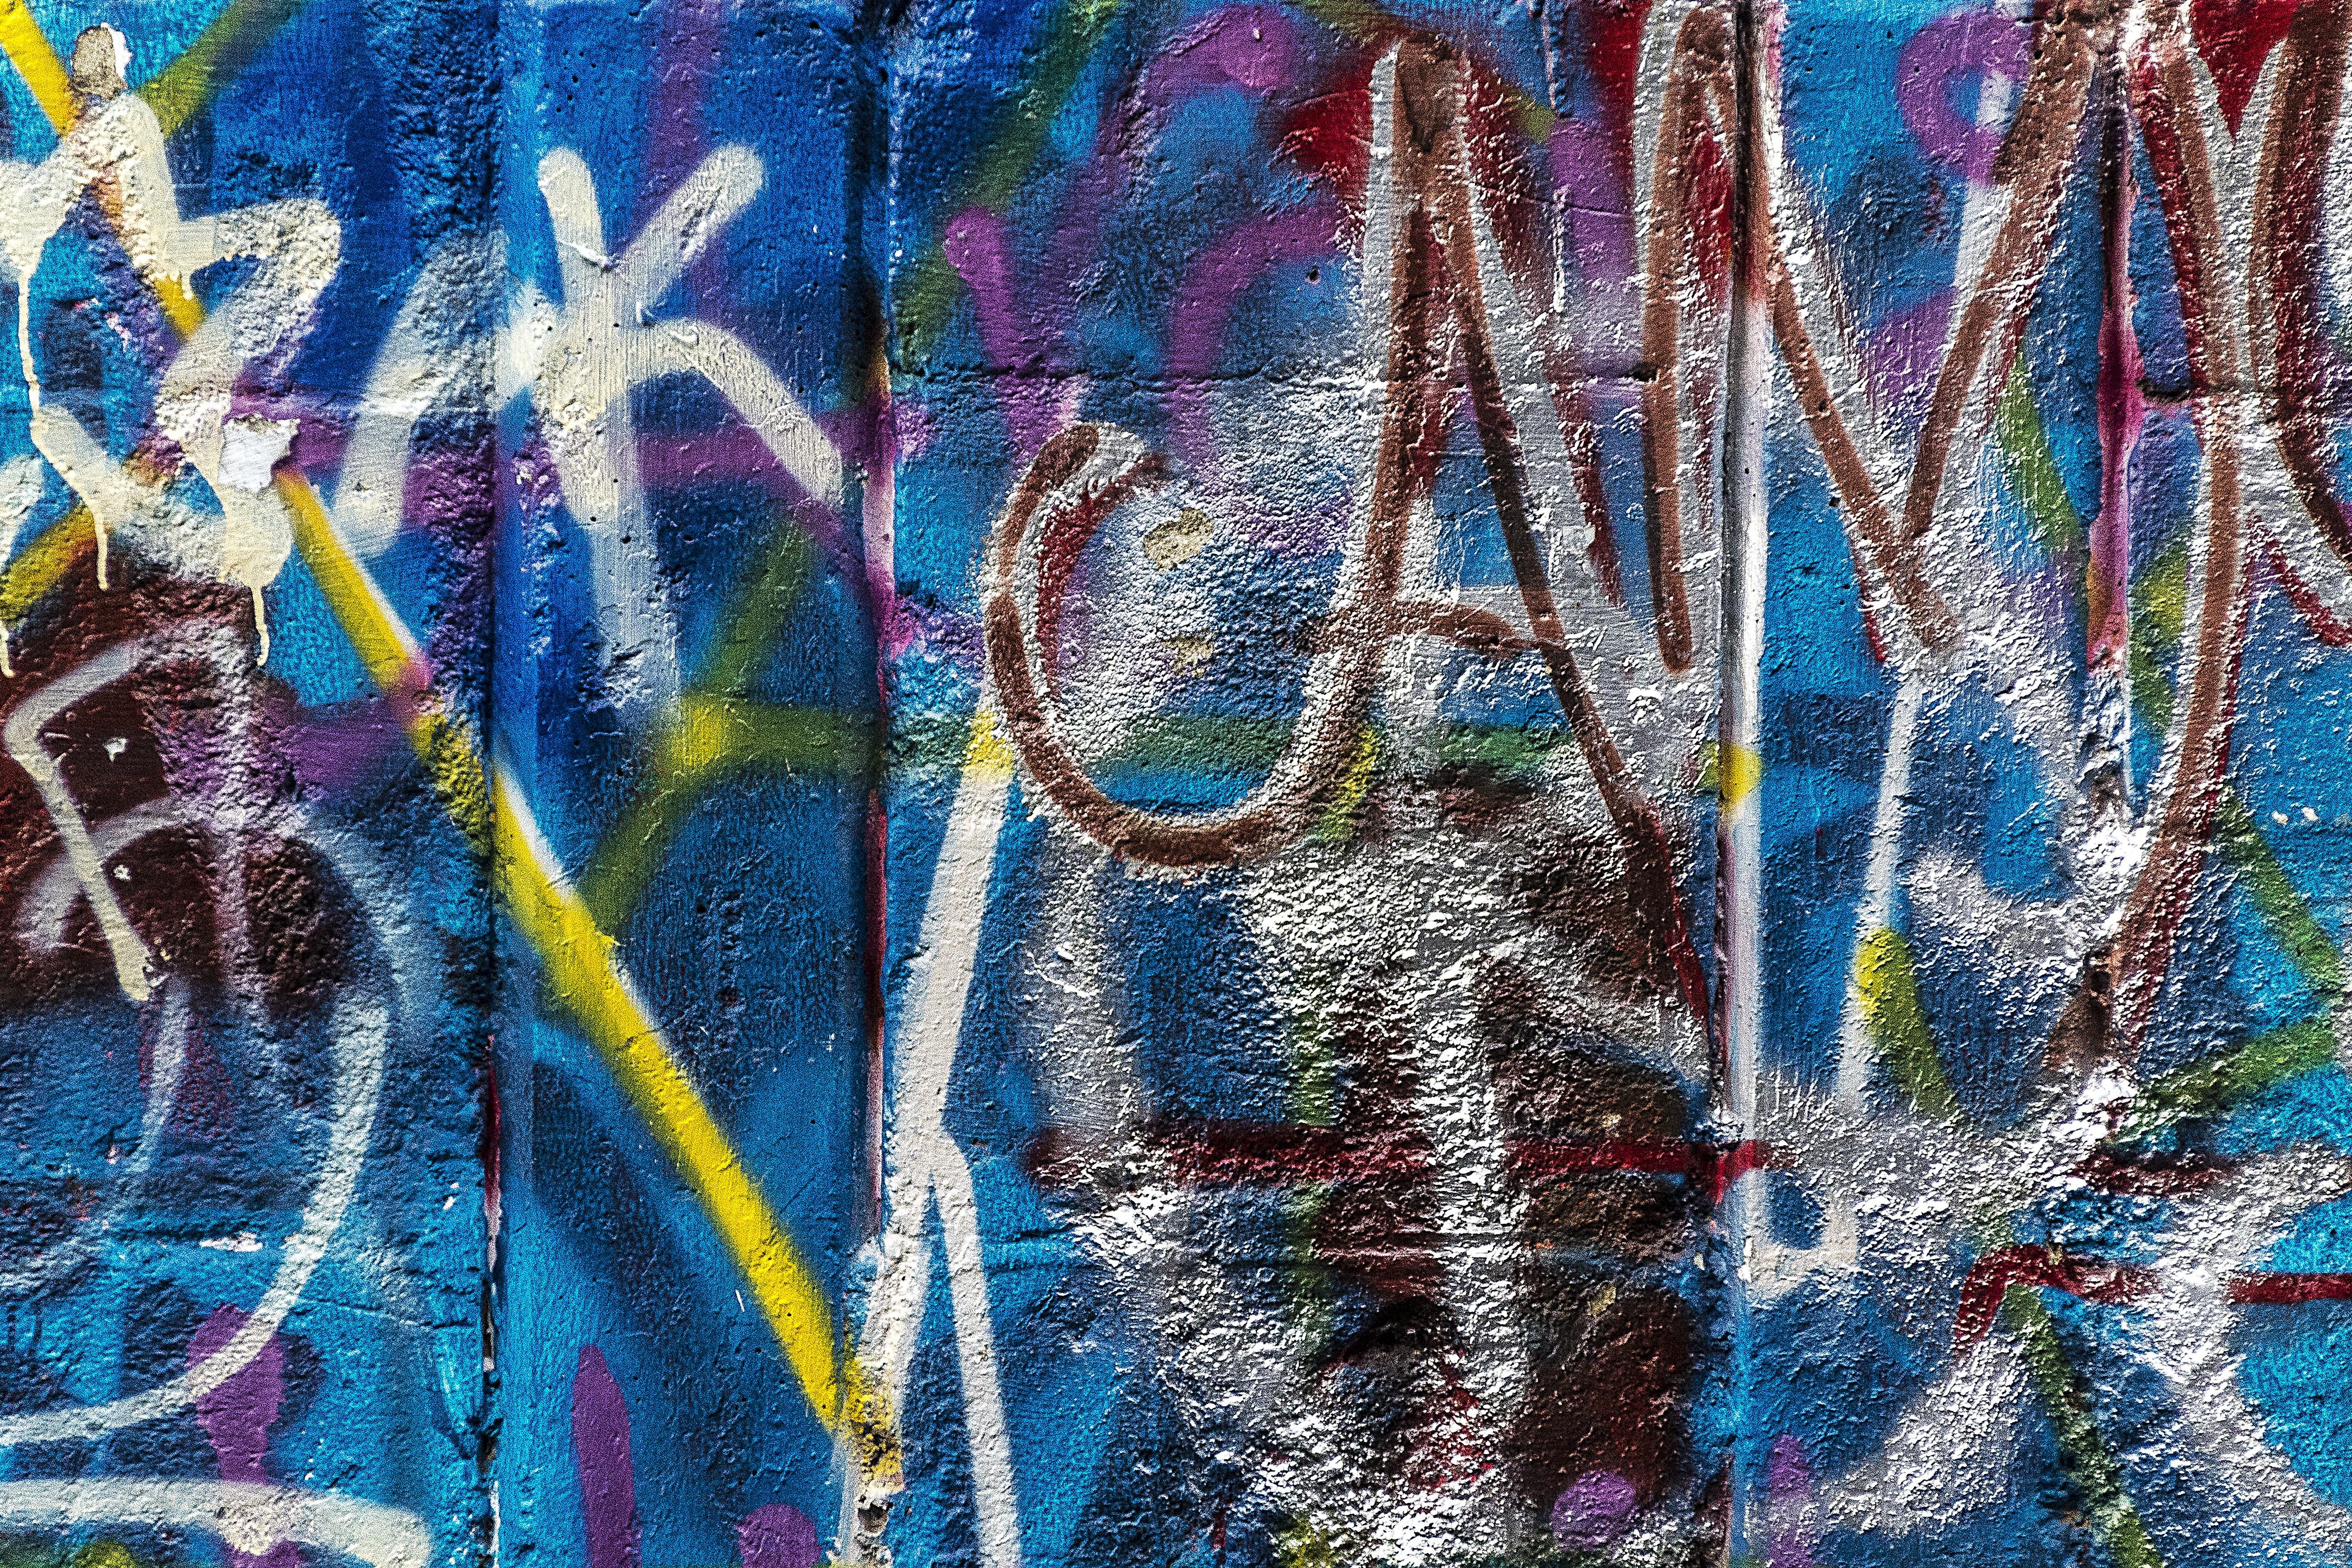 Abstract city urban color artistic grunge graffiti painting street art art vandalism background mural spray paint